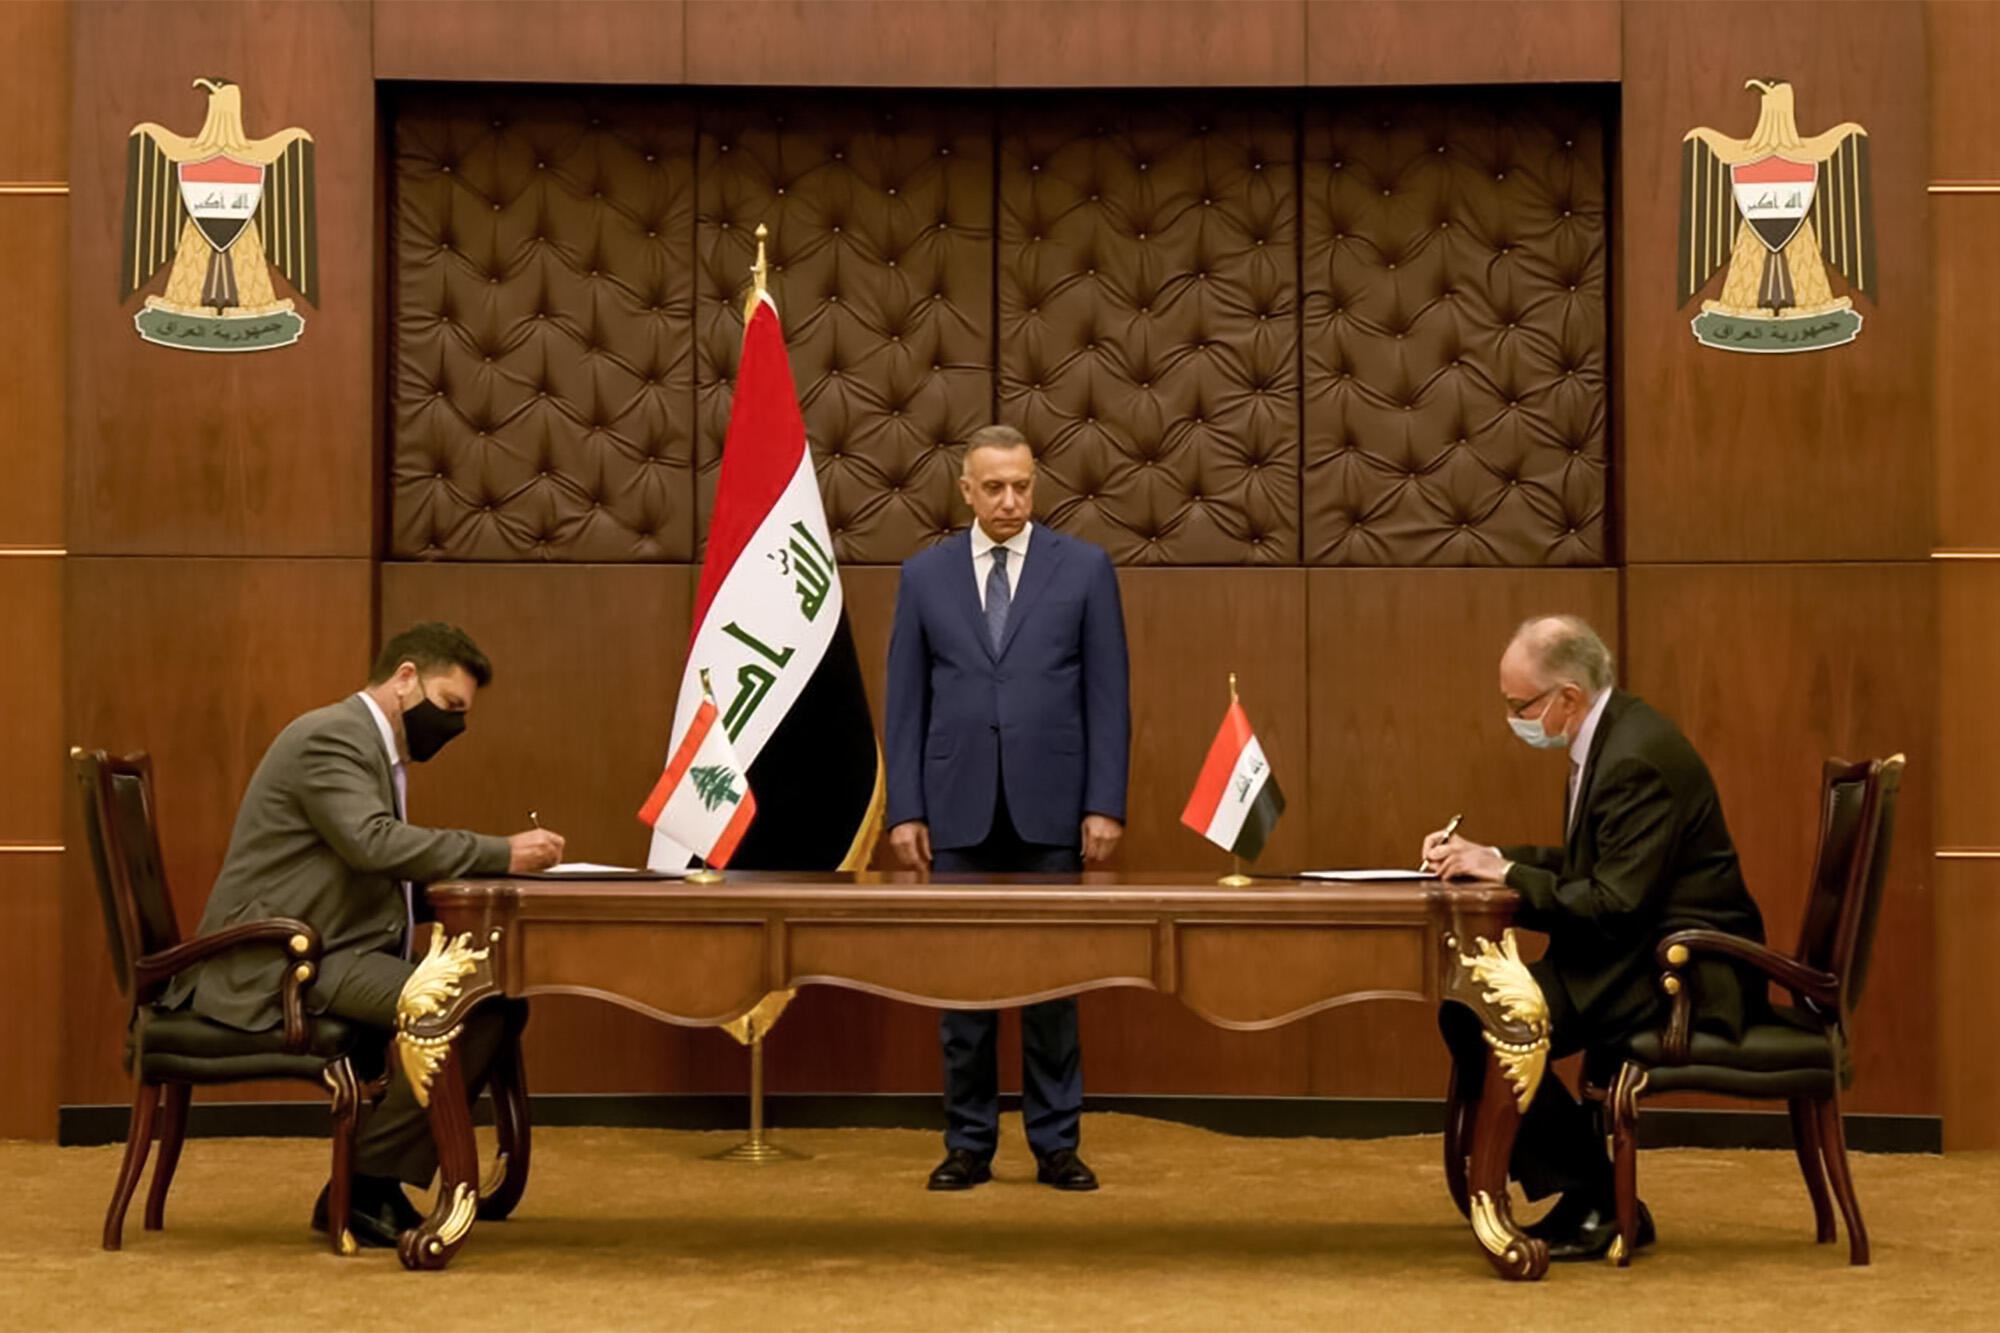 Iraqi Prime Minister Mustafa al-Kadhemi (C) looks on as Lebanon's energy minister Raymond Ghajar (L) and Iraq's Finance Minister Ali Allawi (R) sign bilateral agreements in the capital Baghdad